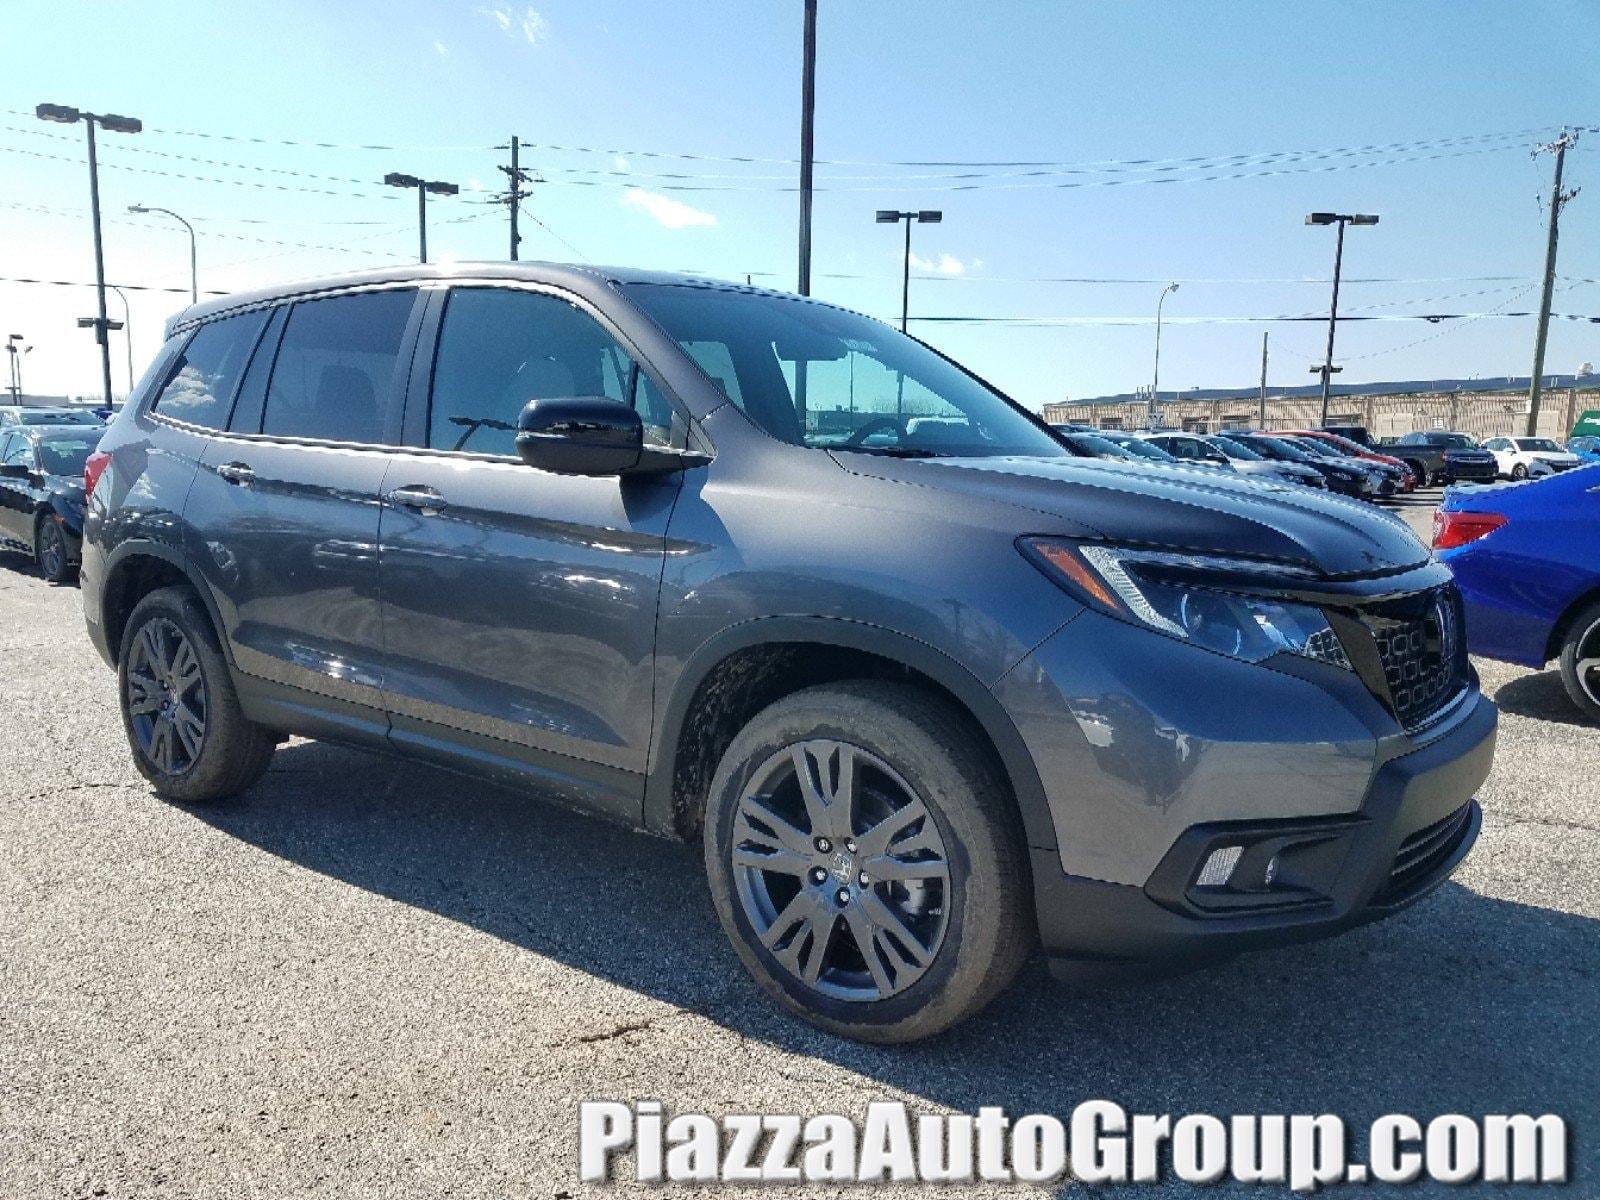 2019 Honda Passport EX-L AWD SUV